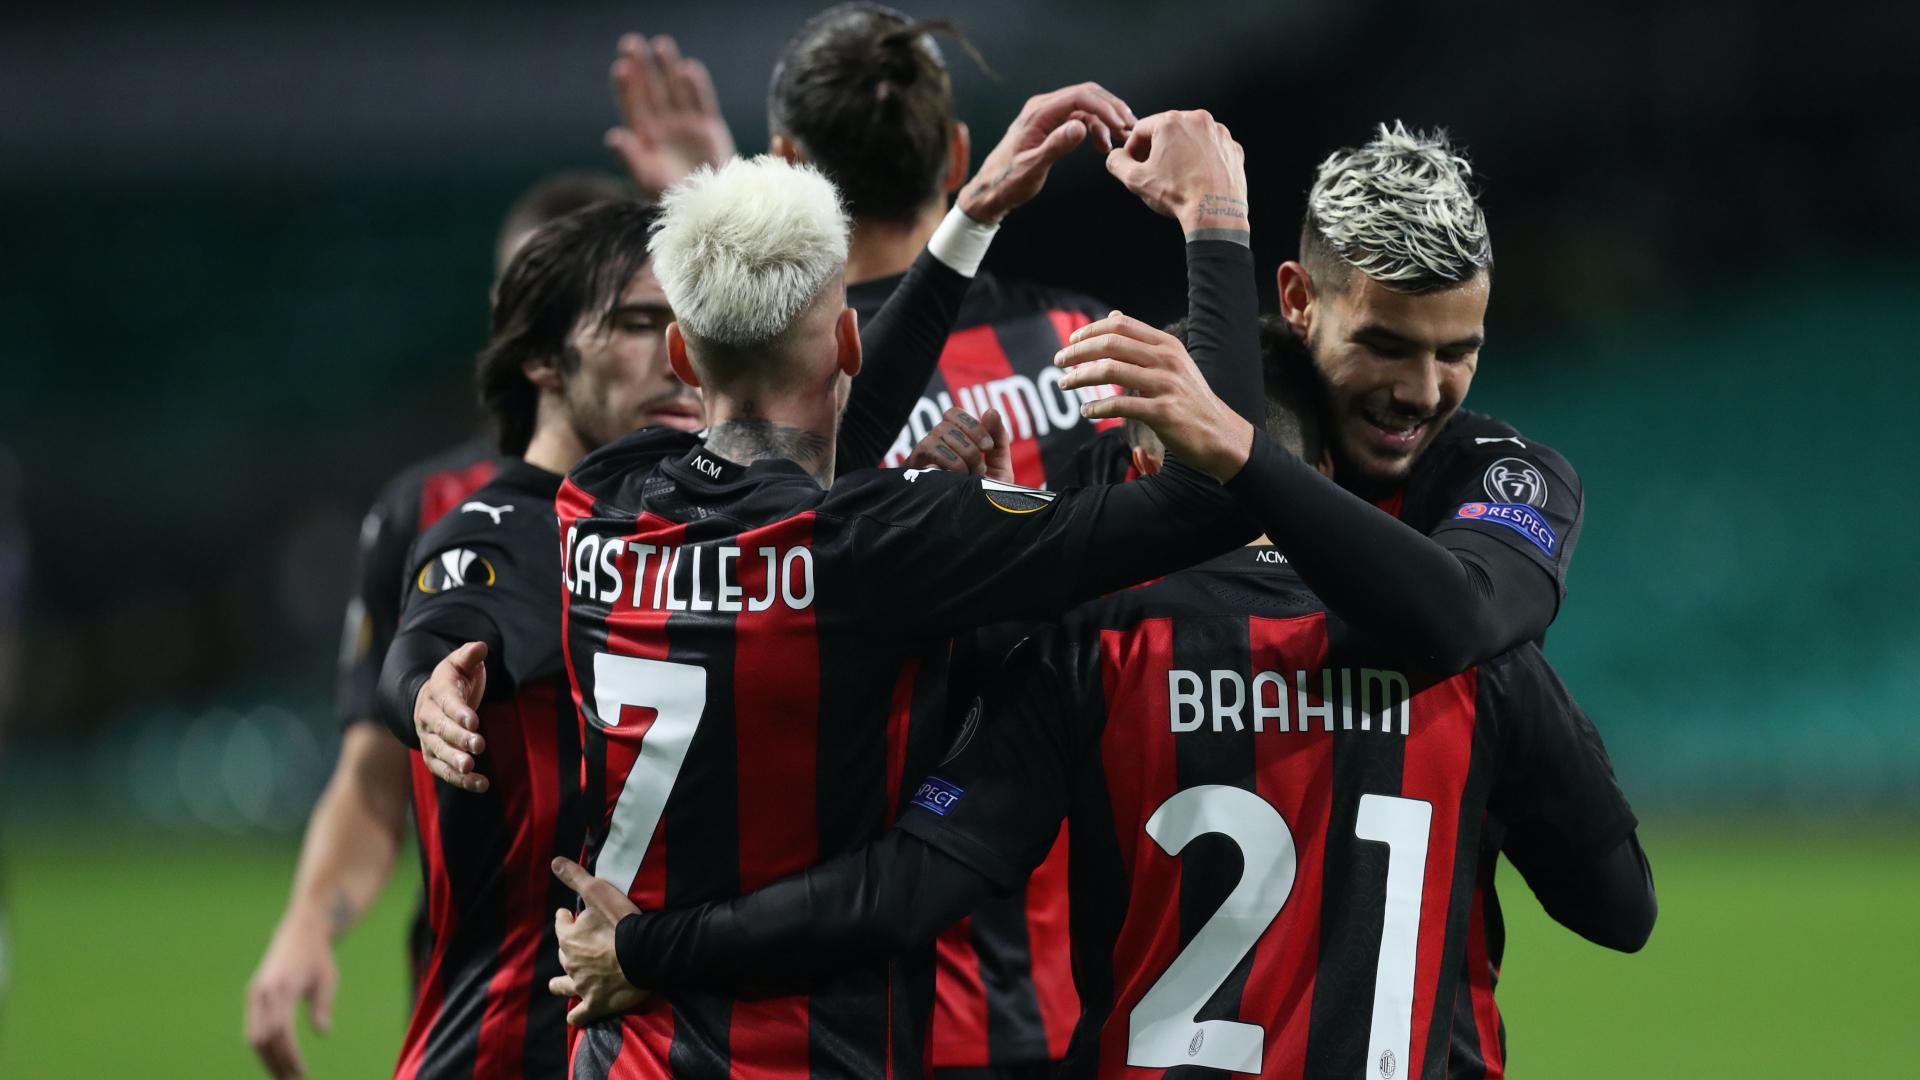 Laporan Pertandingan Milan 3 1 Celtic Goal Com